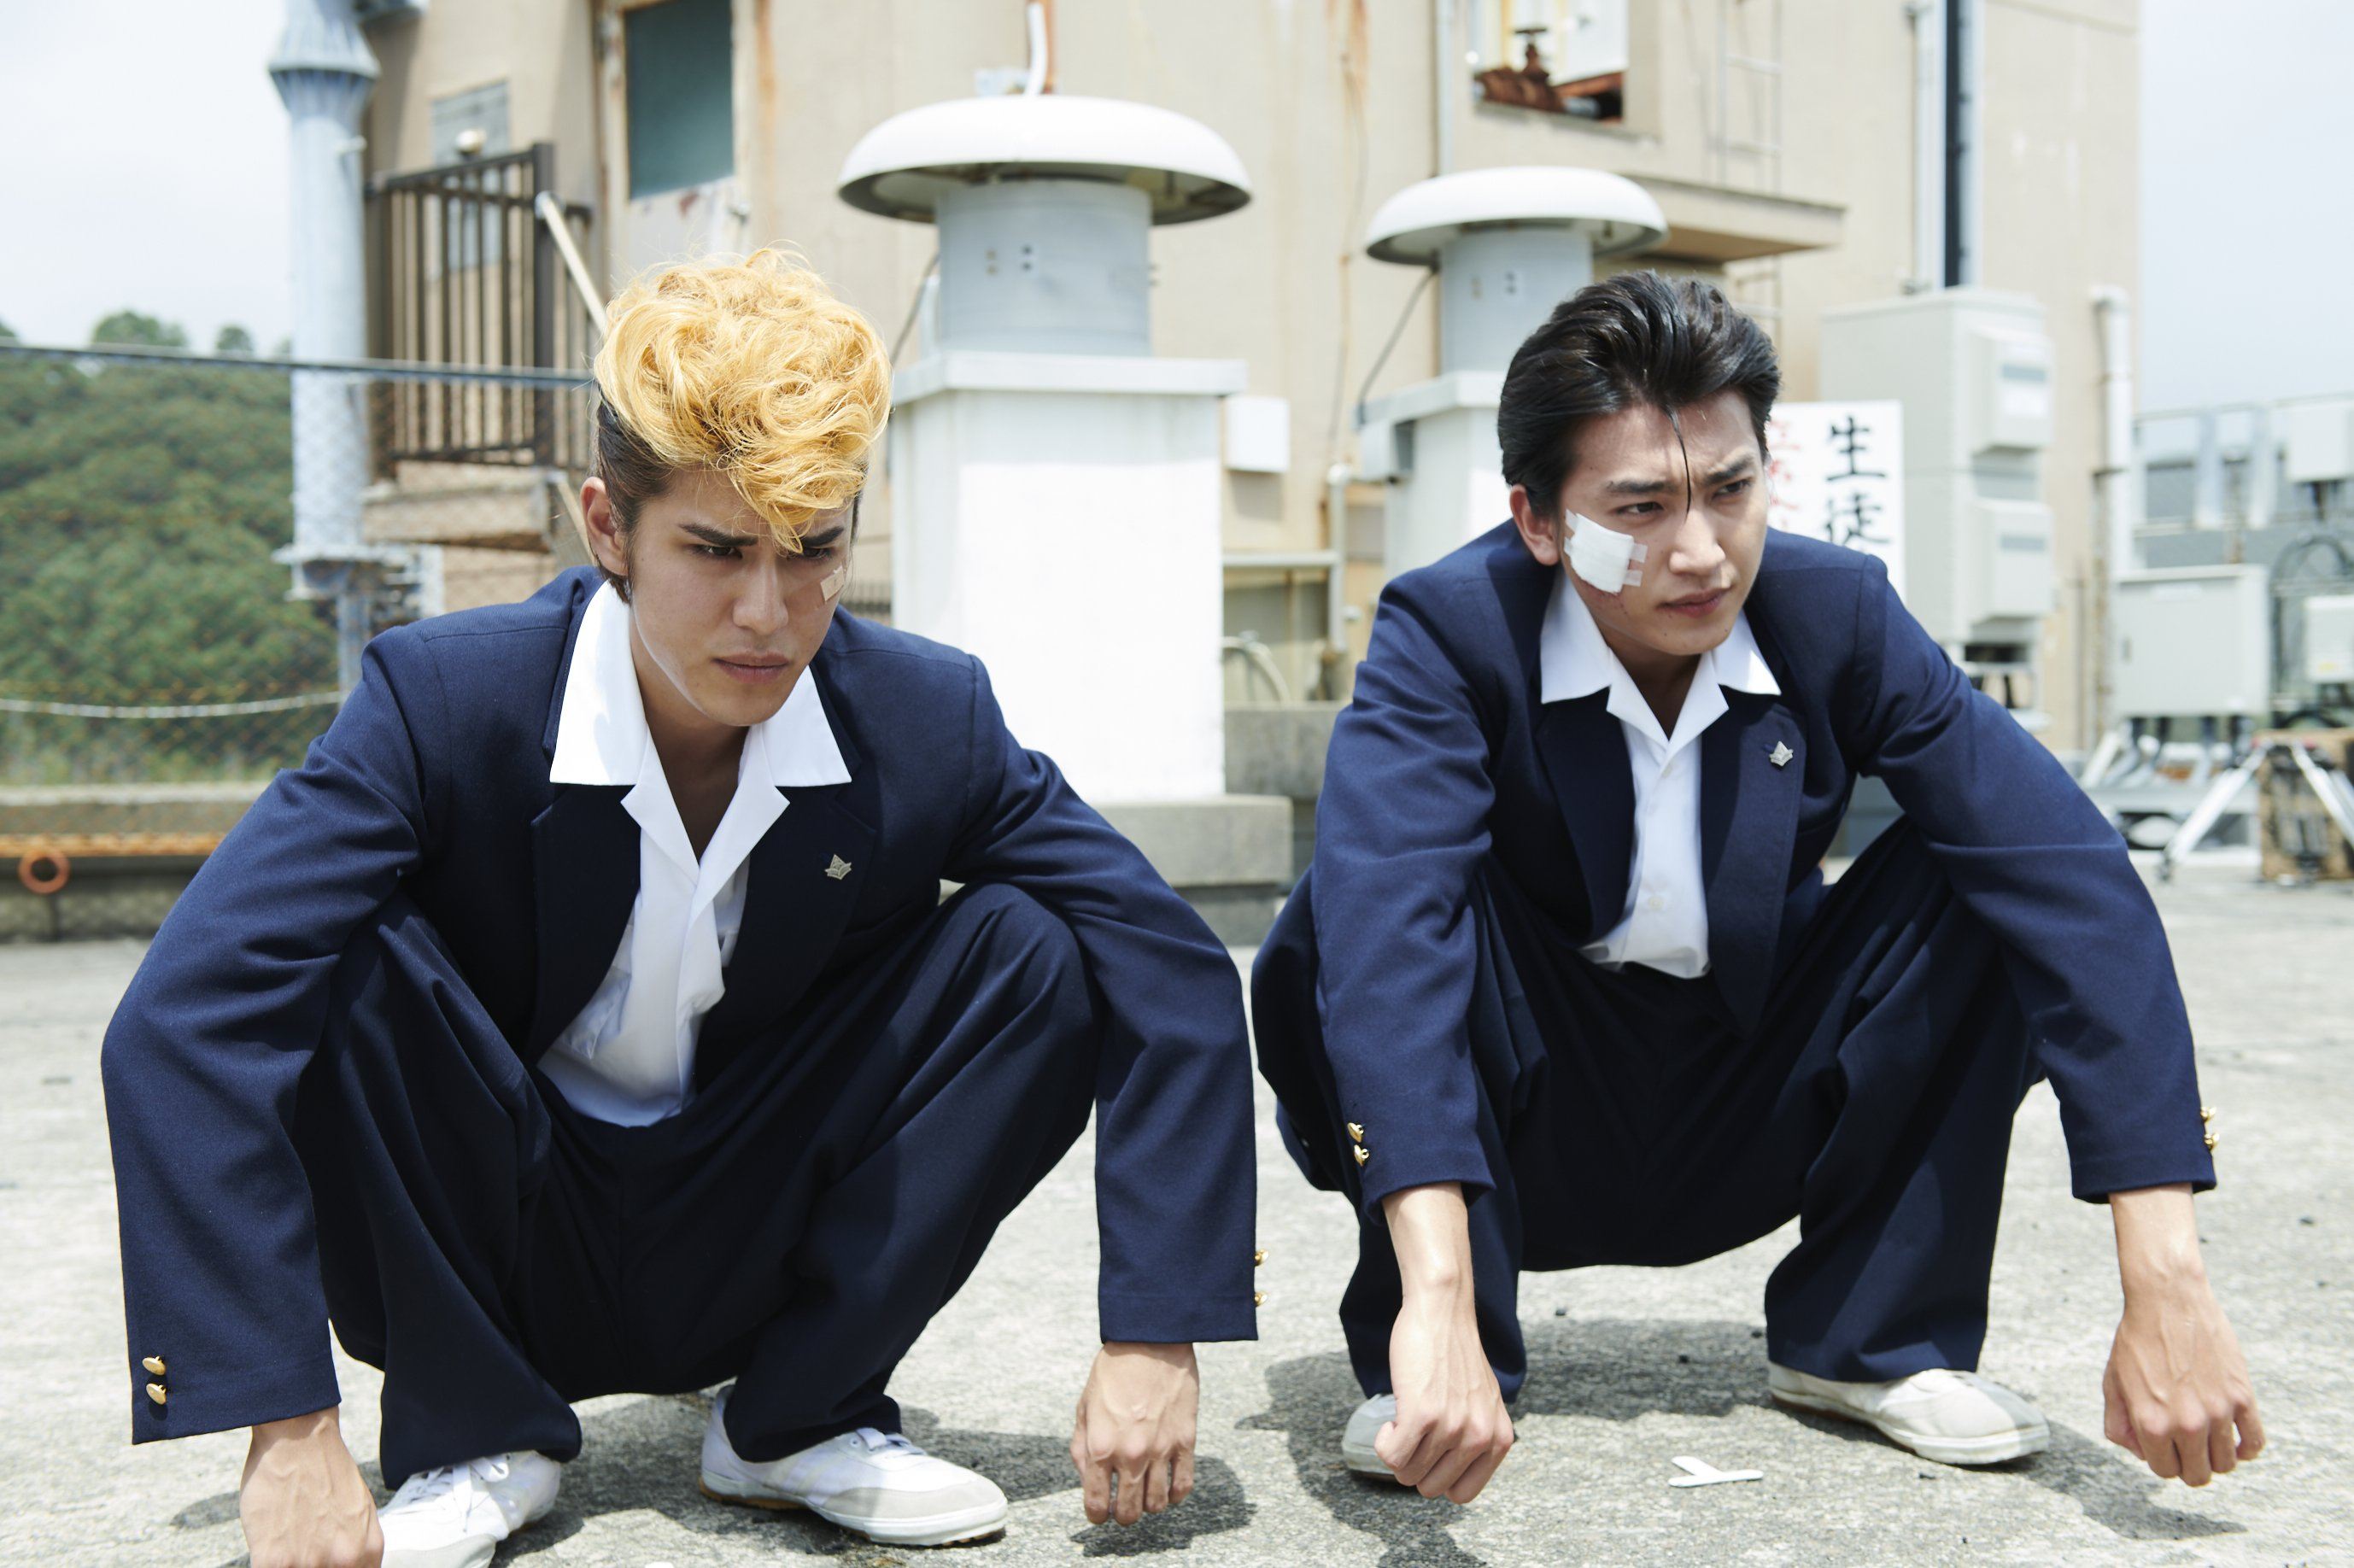 『GTO』の原点、ヤンキー漫画『湘南純愛組!』が寛一郎&金子大地で実写化決定の画像003